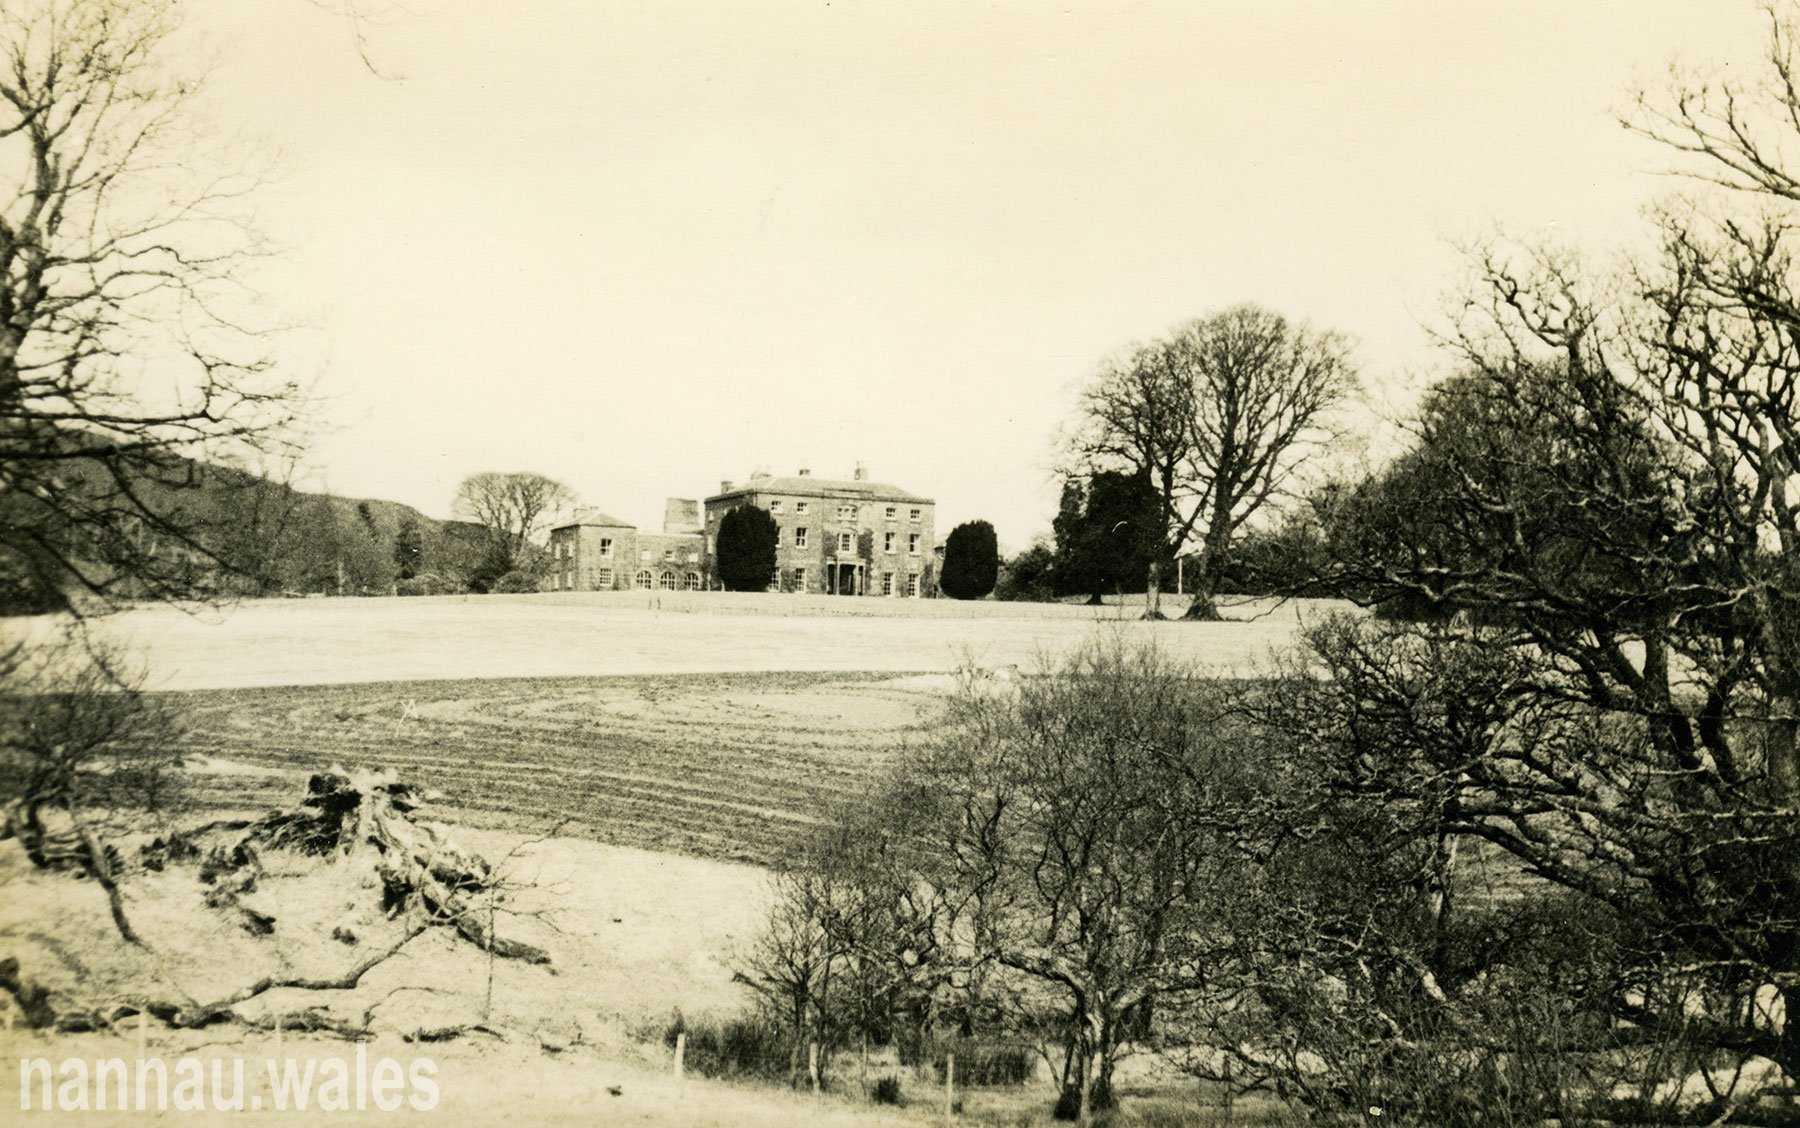 A Postcard of Plas Nannau Hall from the 1960s